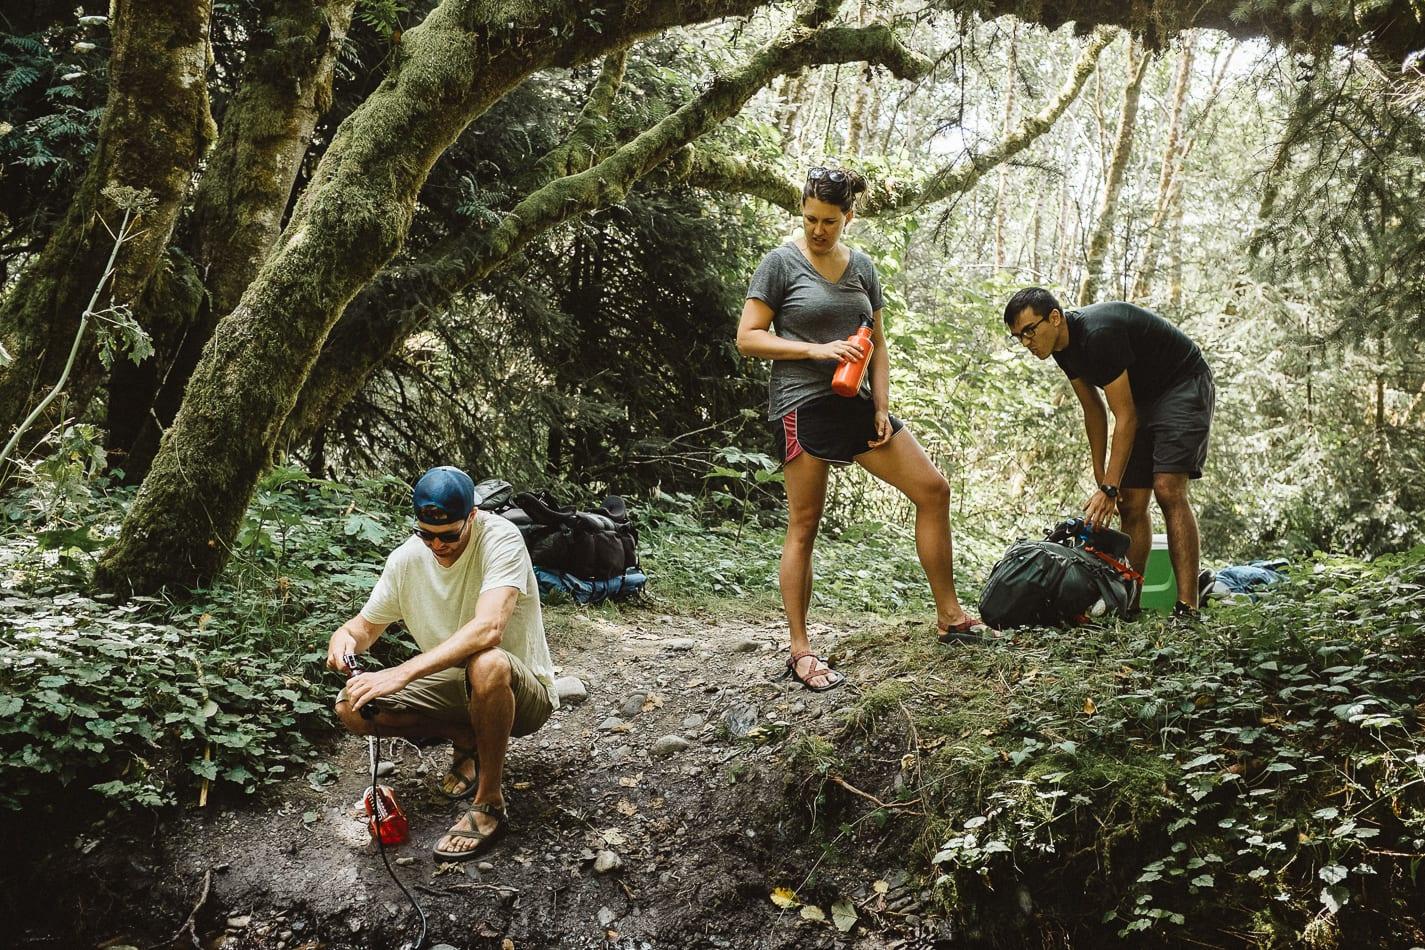 patricks-point-beach-camping-california-adventure-photographer-29